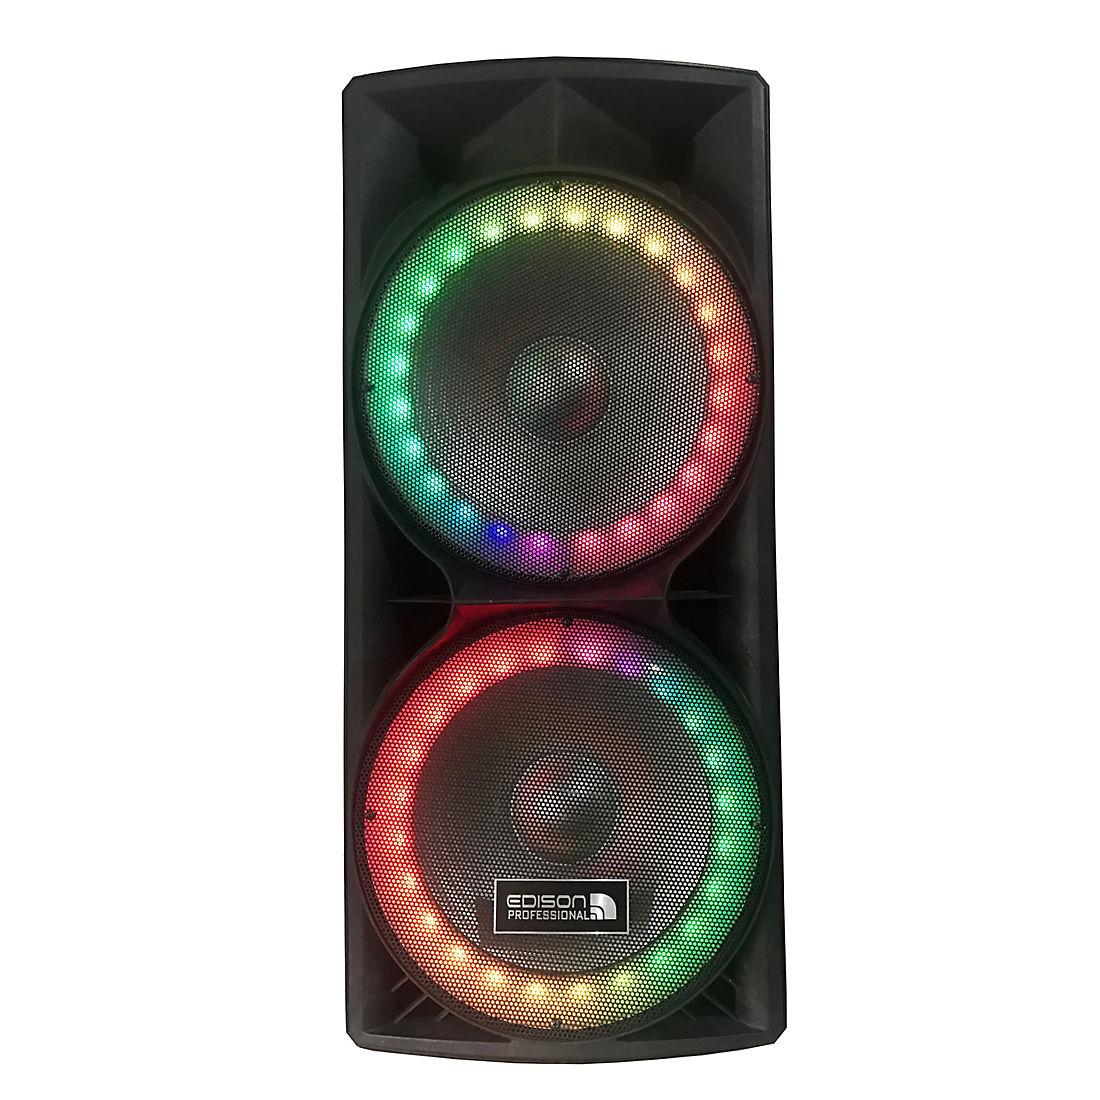 Edison Professional Britelite M-7000 High Power Bluetooth PA Speaker